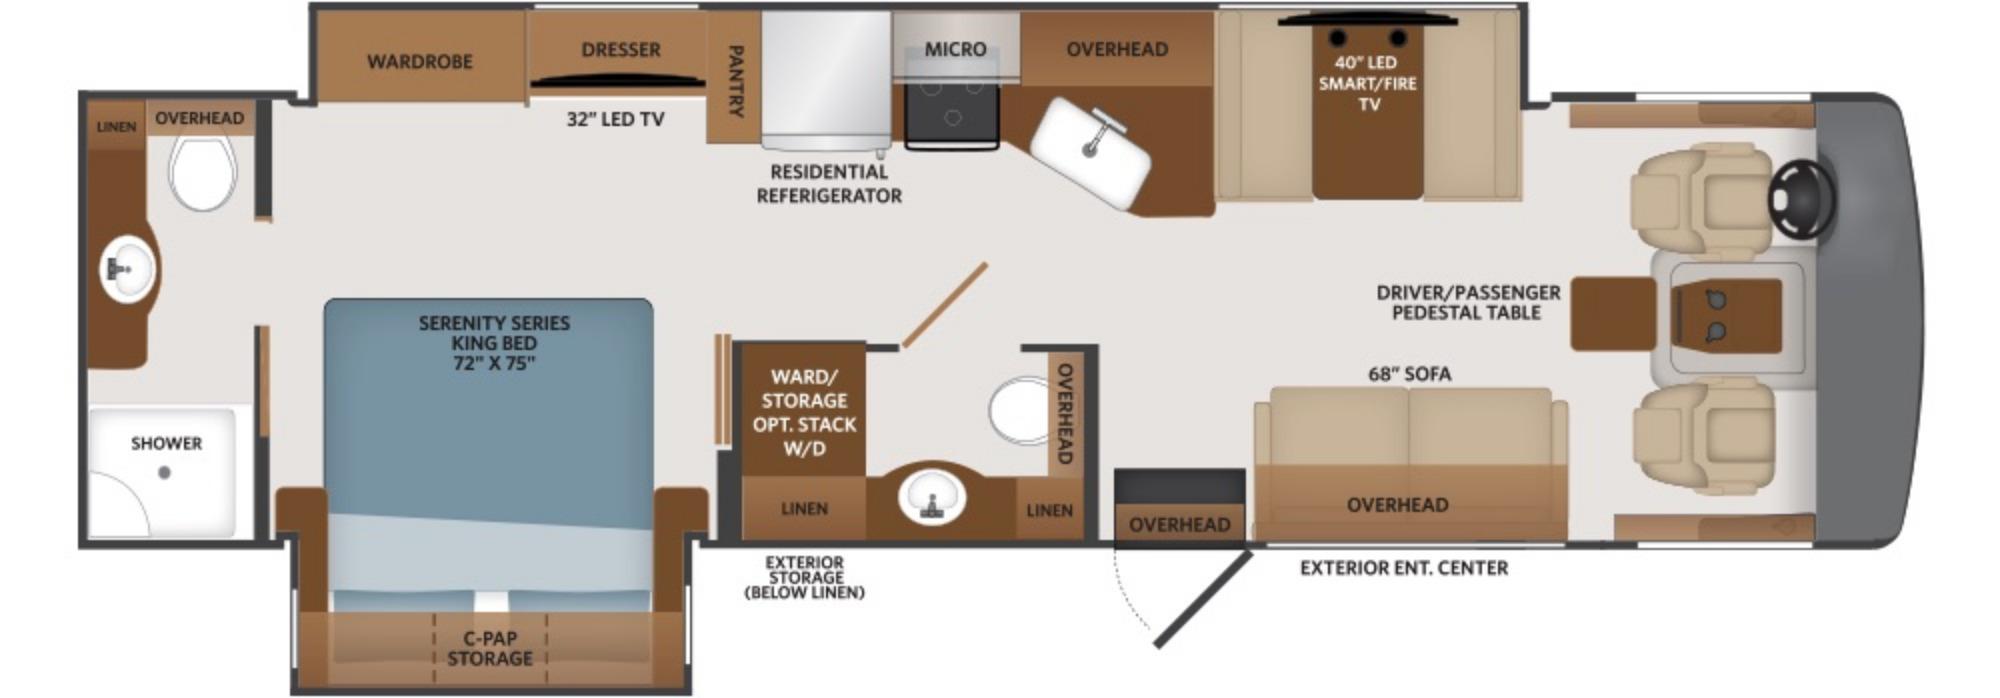 View Floor Plan for 2022 FLEETWOOD FORTIS 33HB